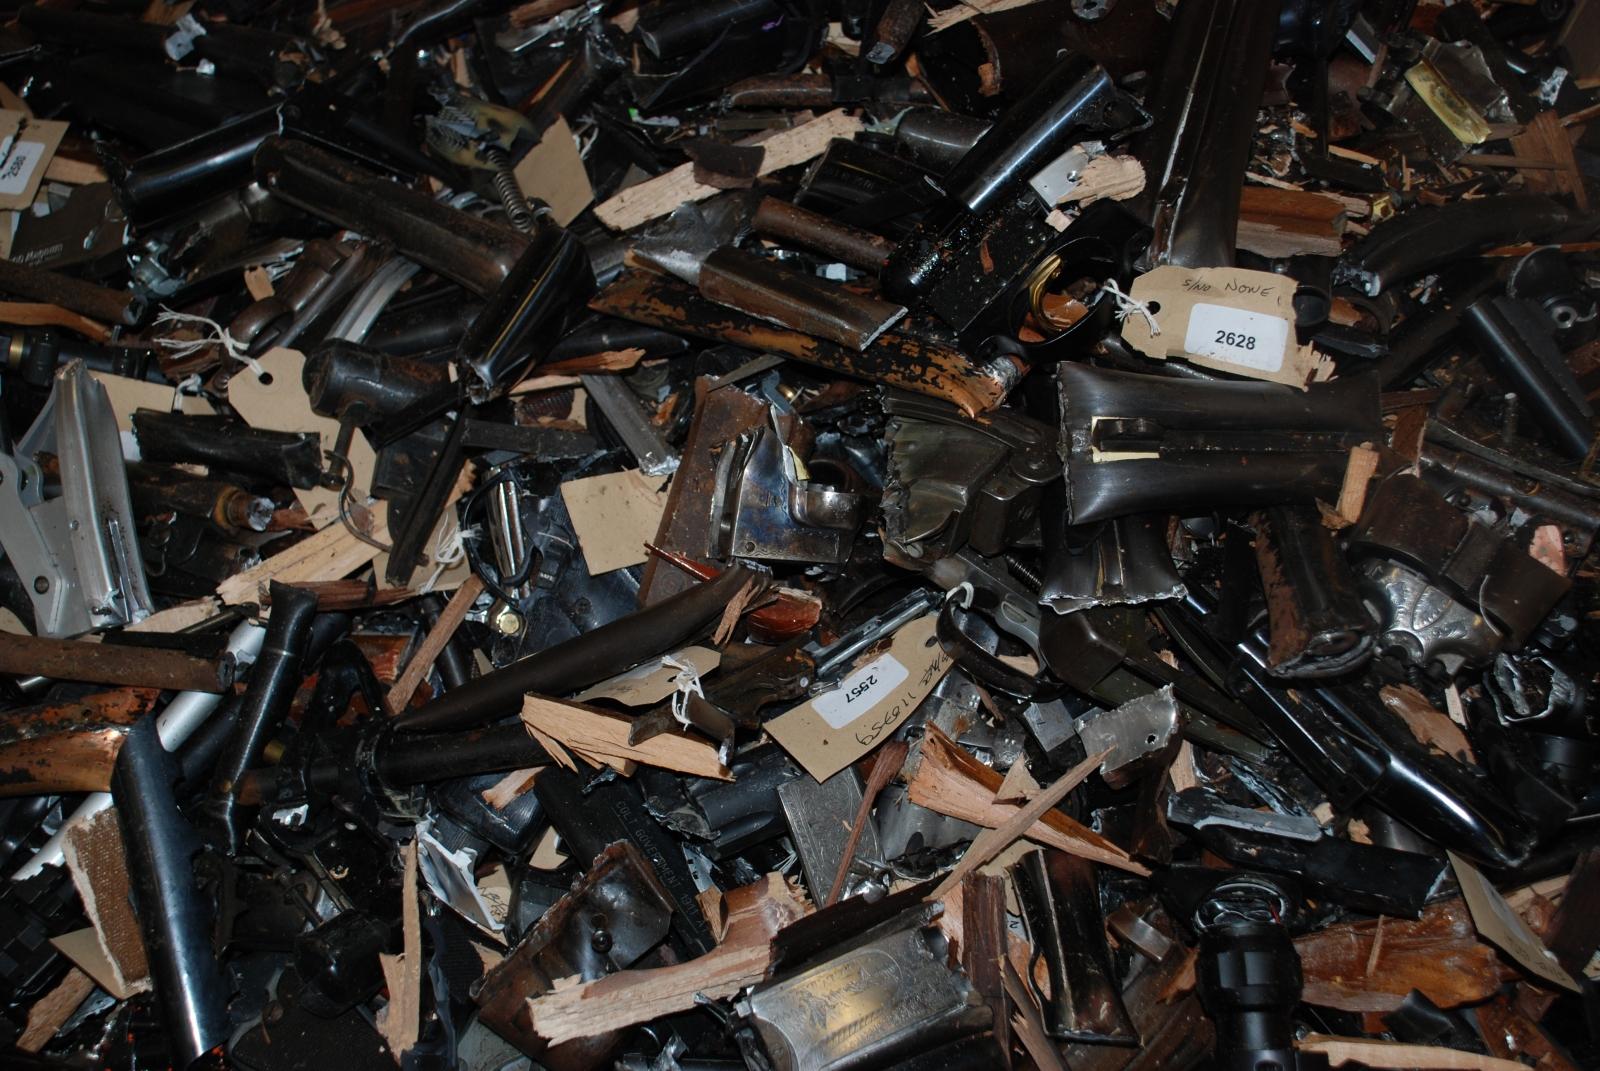 gangland uk nationwide gun amnesty gives gangsters chance